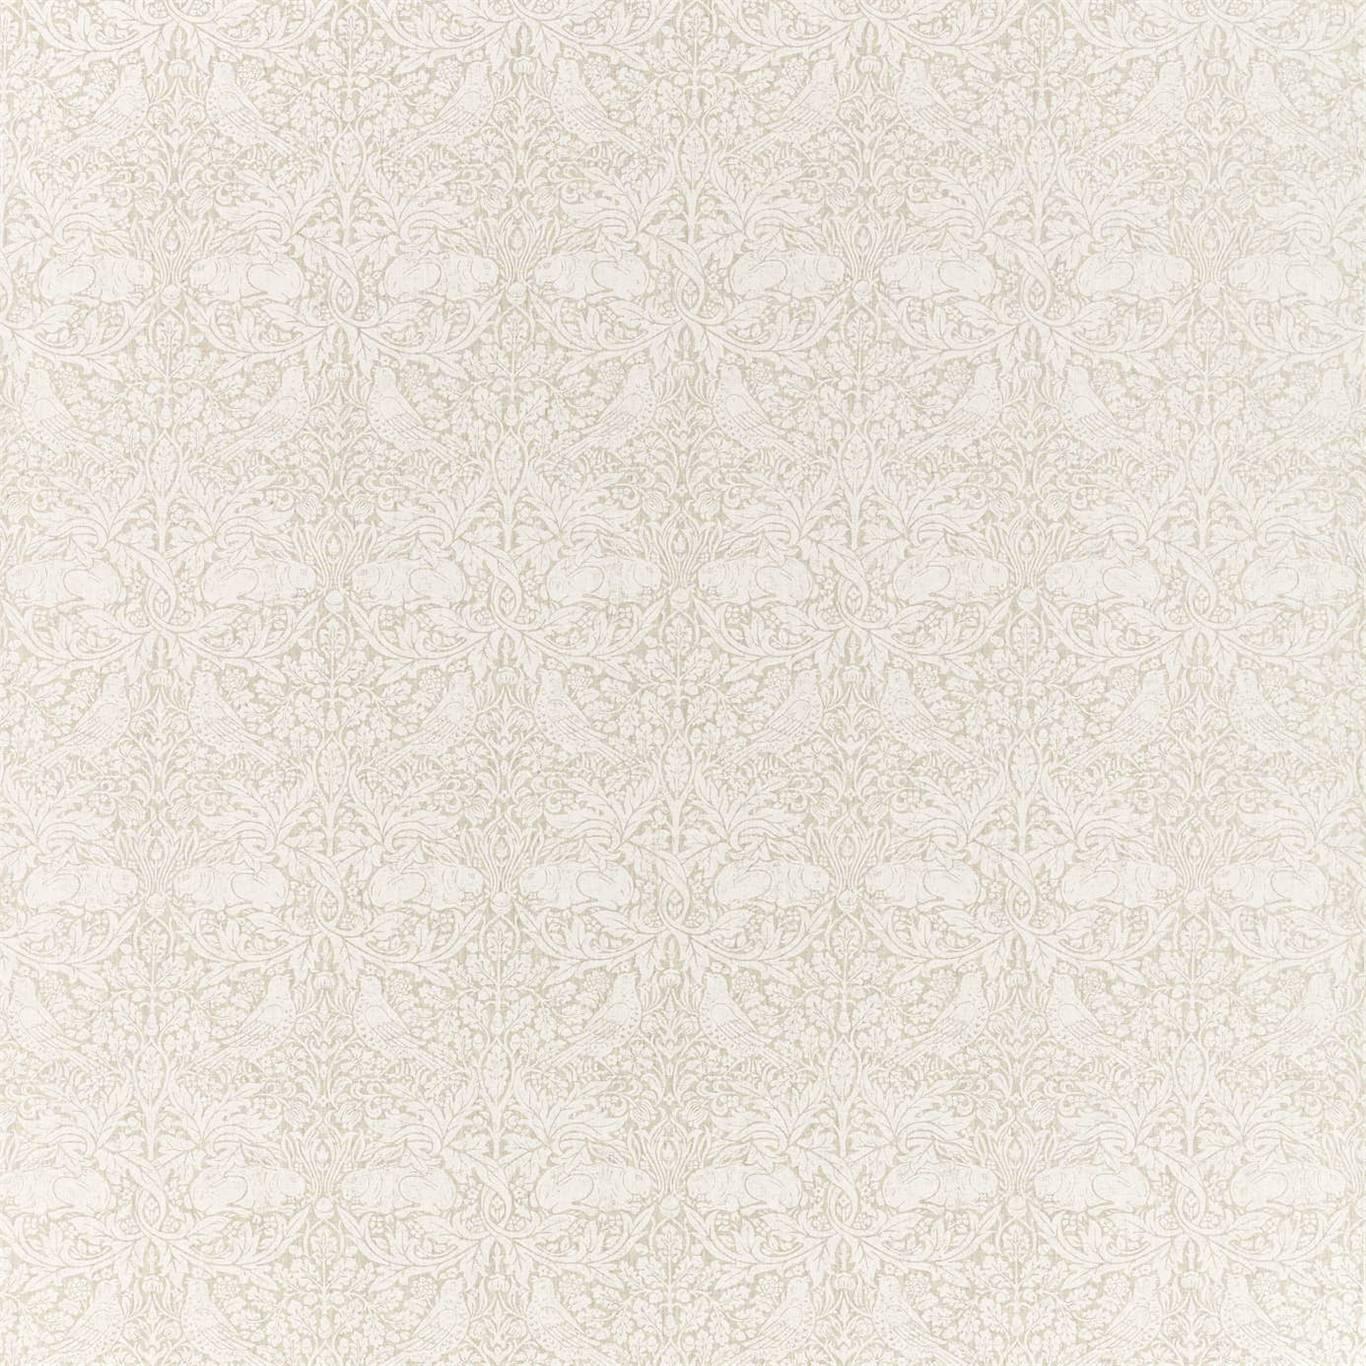 Image of Morris & Co Pure Brer Rabbit Print Linen Fabric 226478